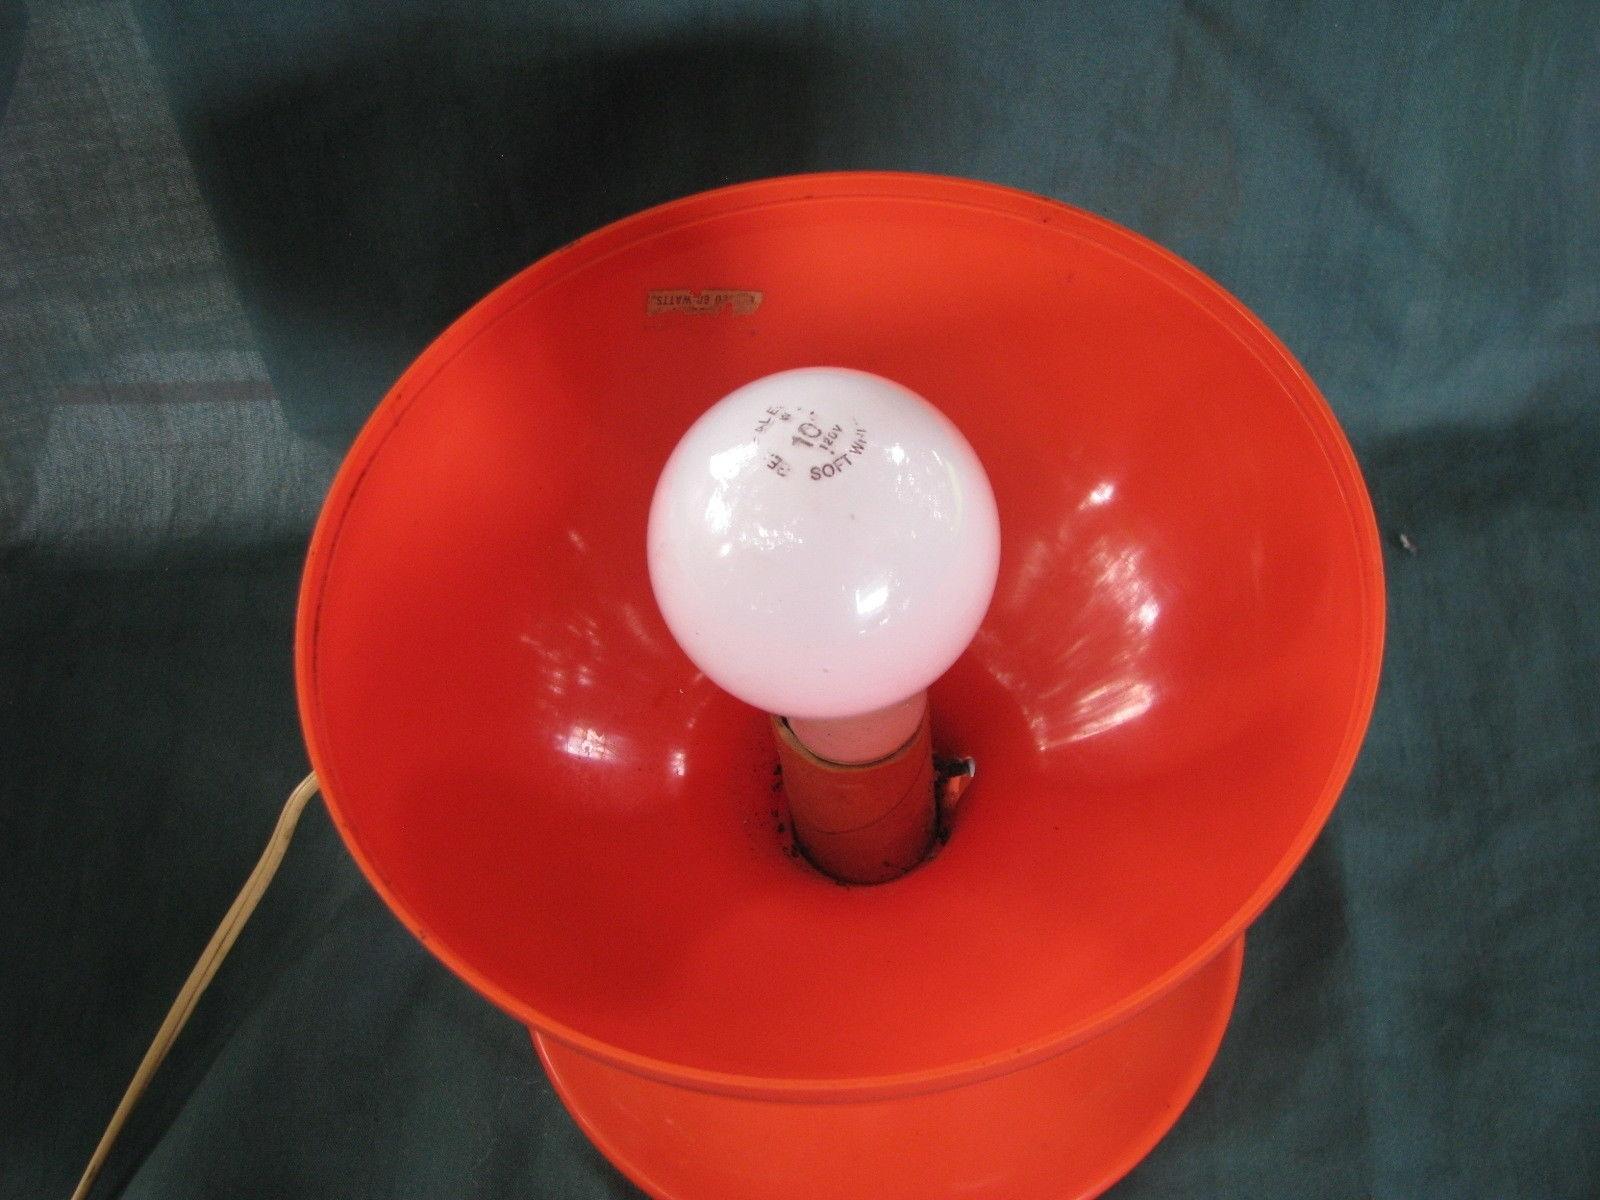 Vintage Mid-Century Modern Plastic Egg Table Lamp ,c.n Burman,orange with regard to Mid-Century Modern Egg Tables (Image 27 of 30)